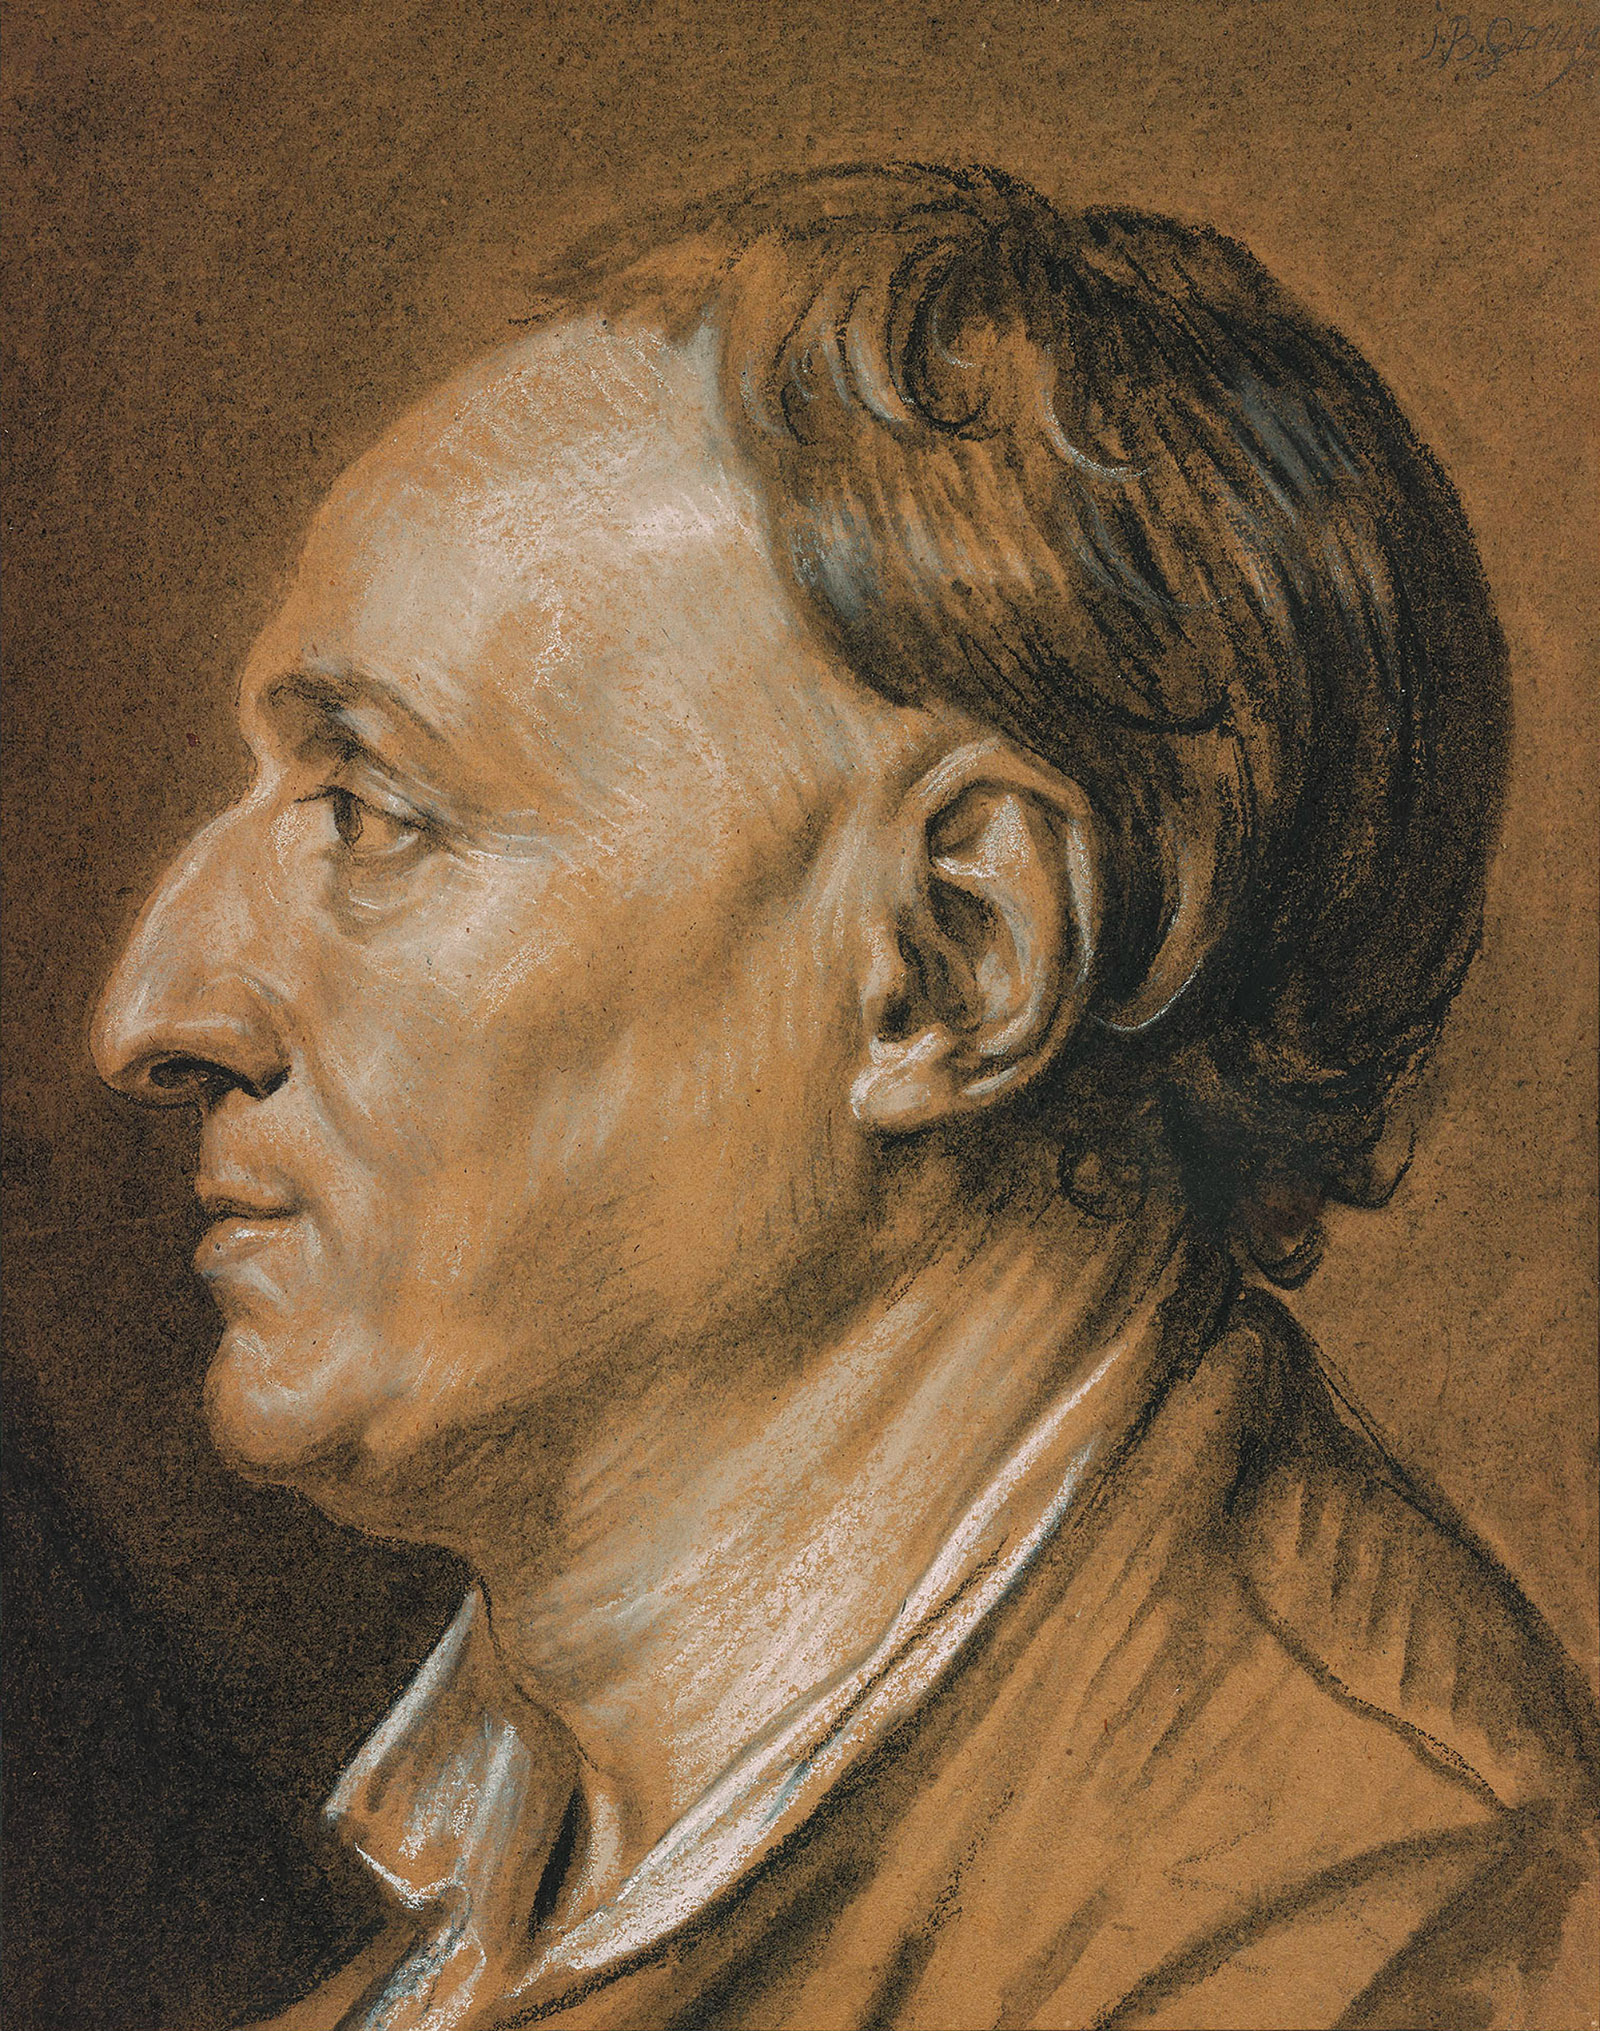 Jean-Baptiste Greuze: Portrait of Denis Diderot, eighteenth century